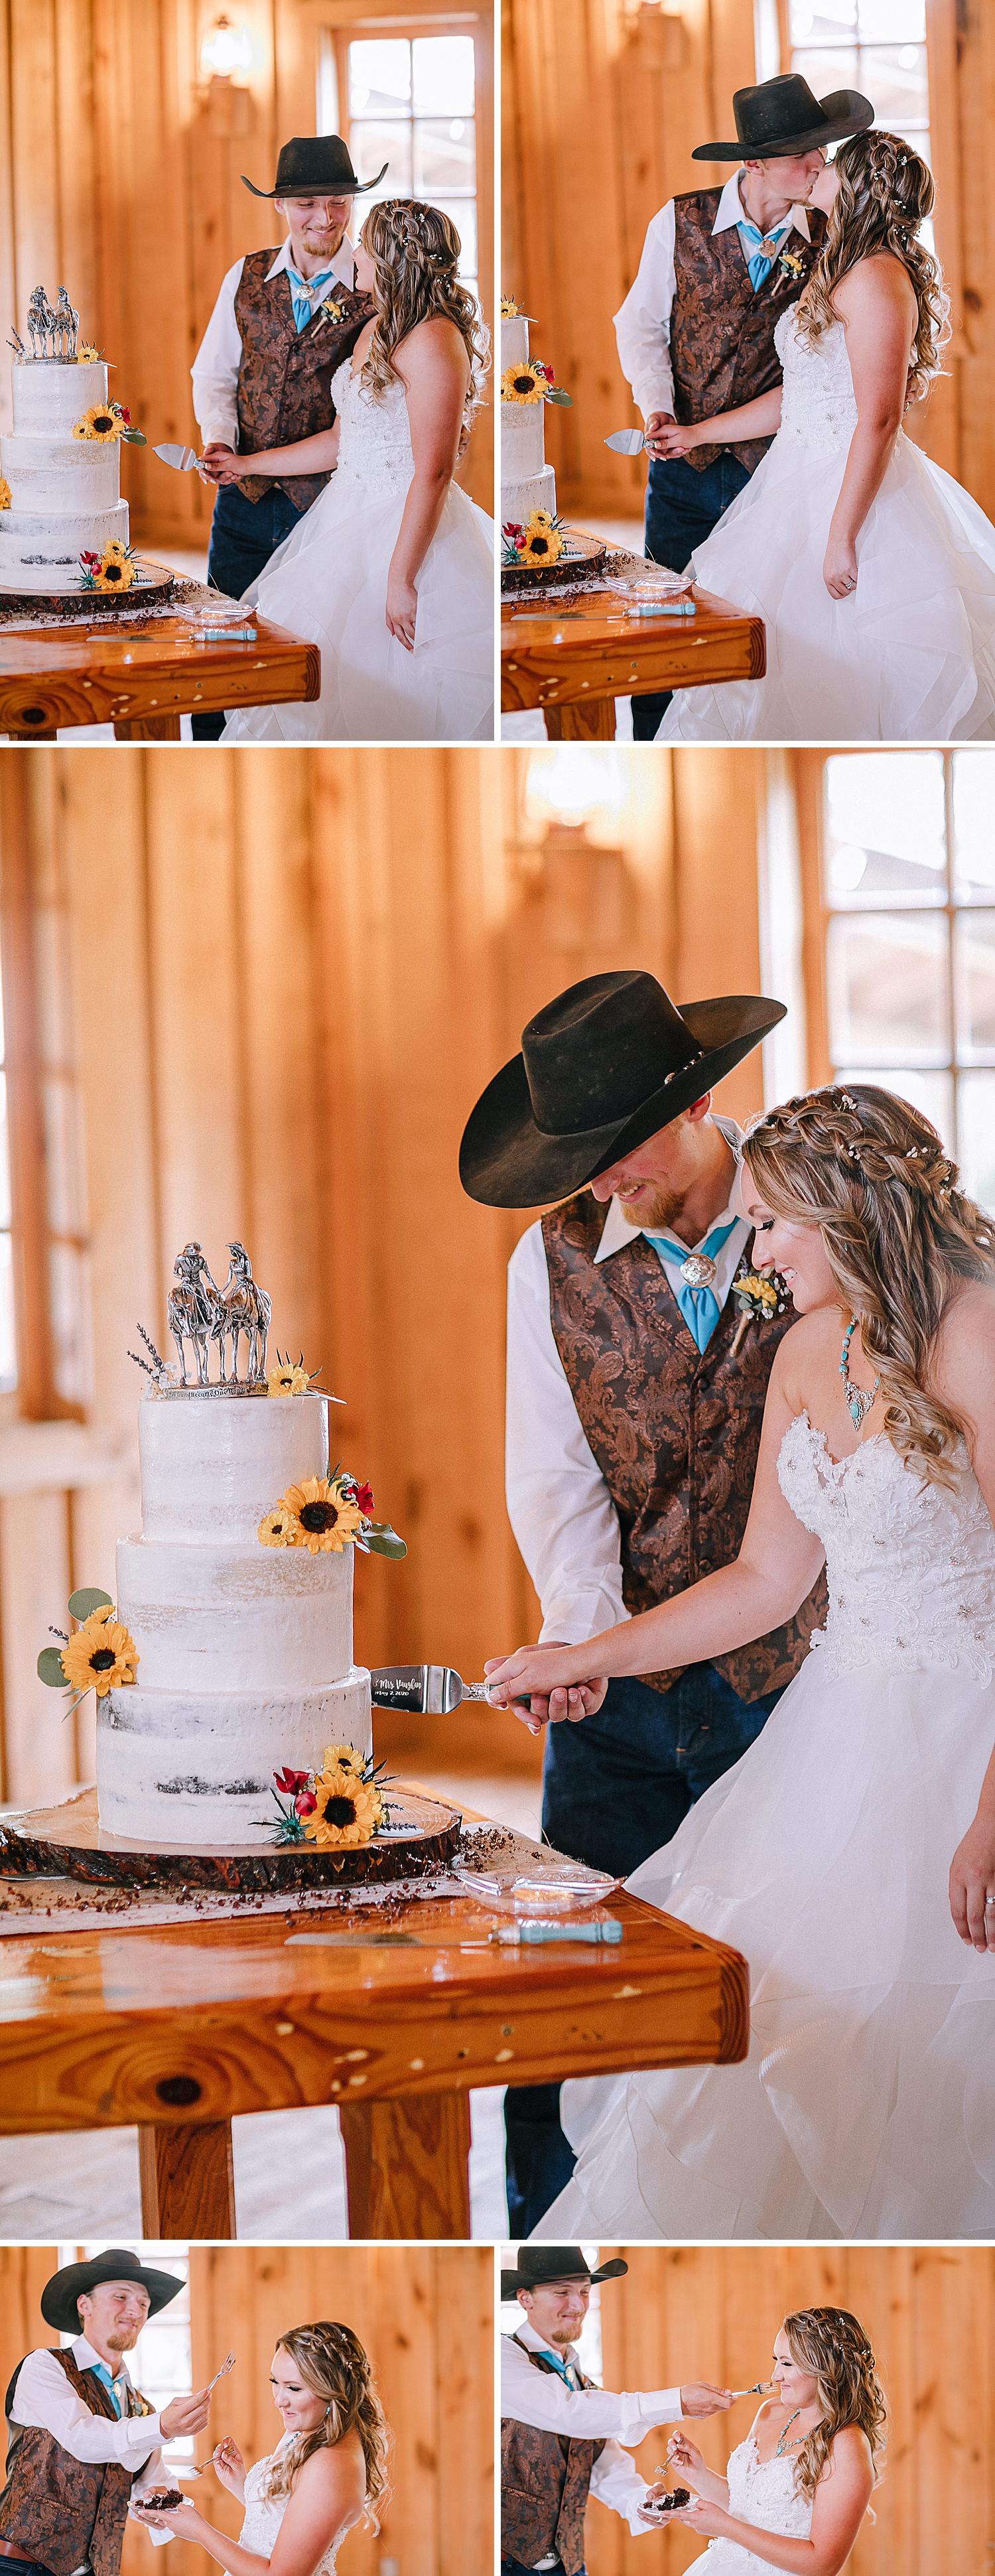 Carly-Barton-Photography-Old-Town-Texas-Rustic-Wedding-Photos-Sunflowers-Boots-Kyle-Texas_0100.jpg